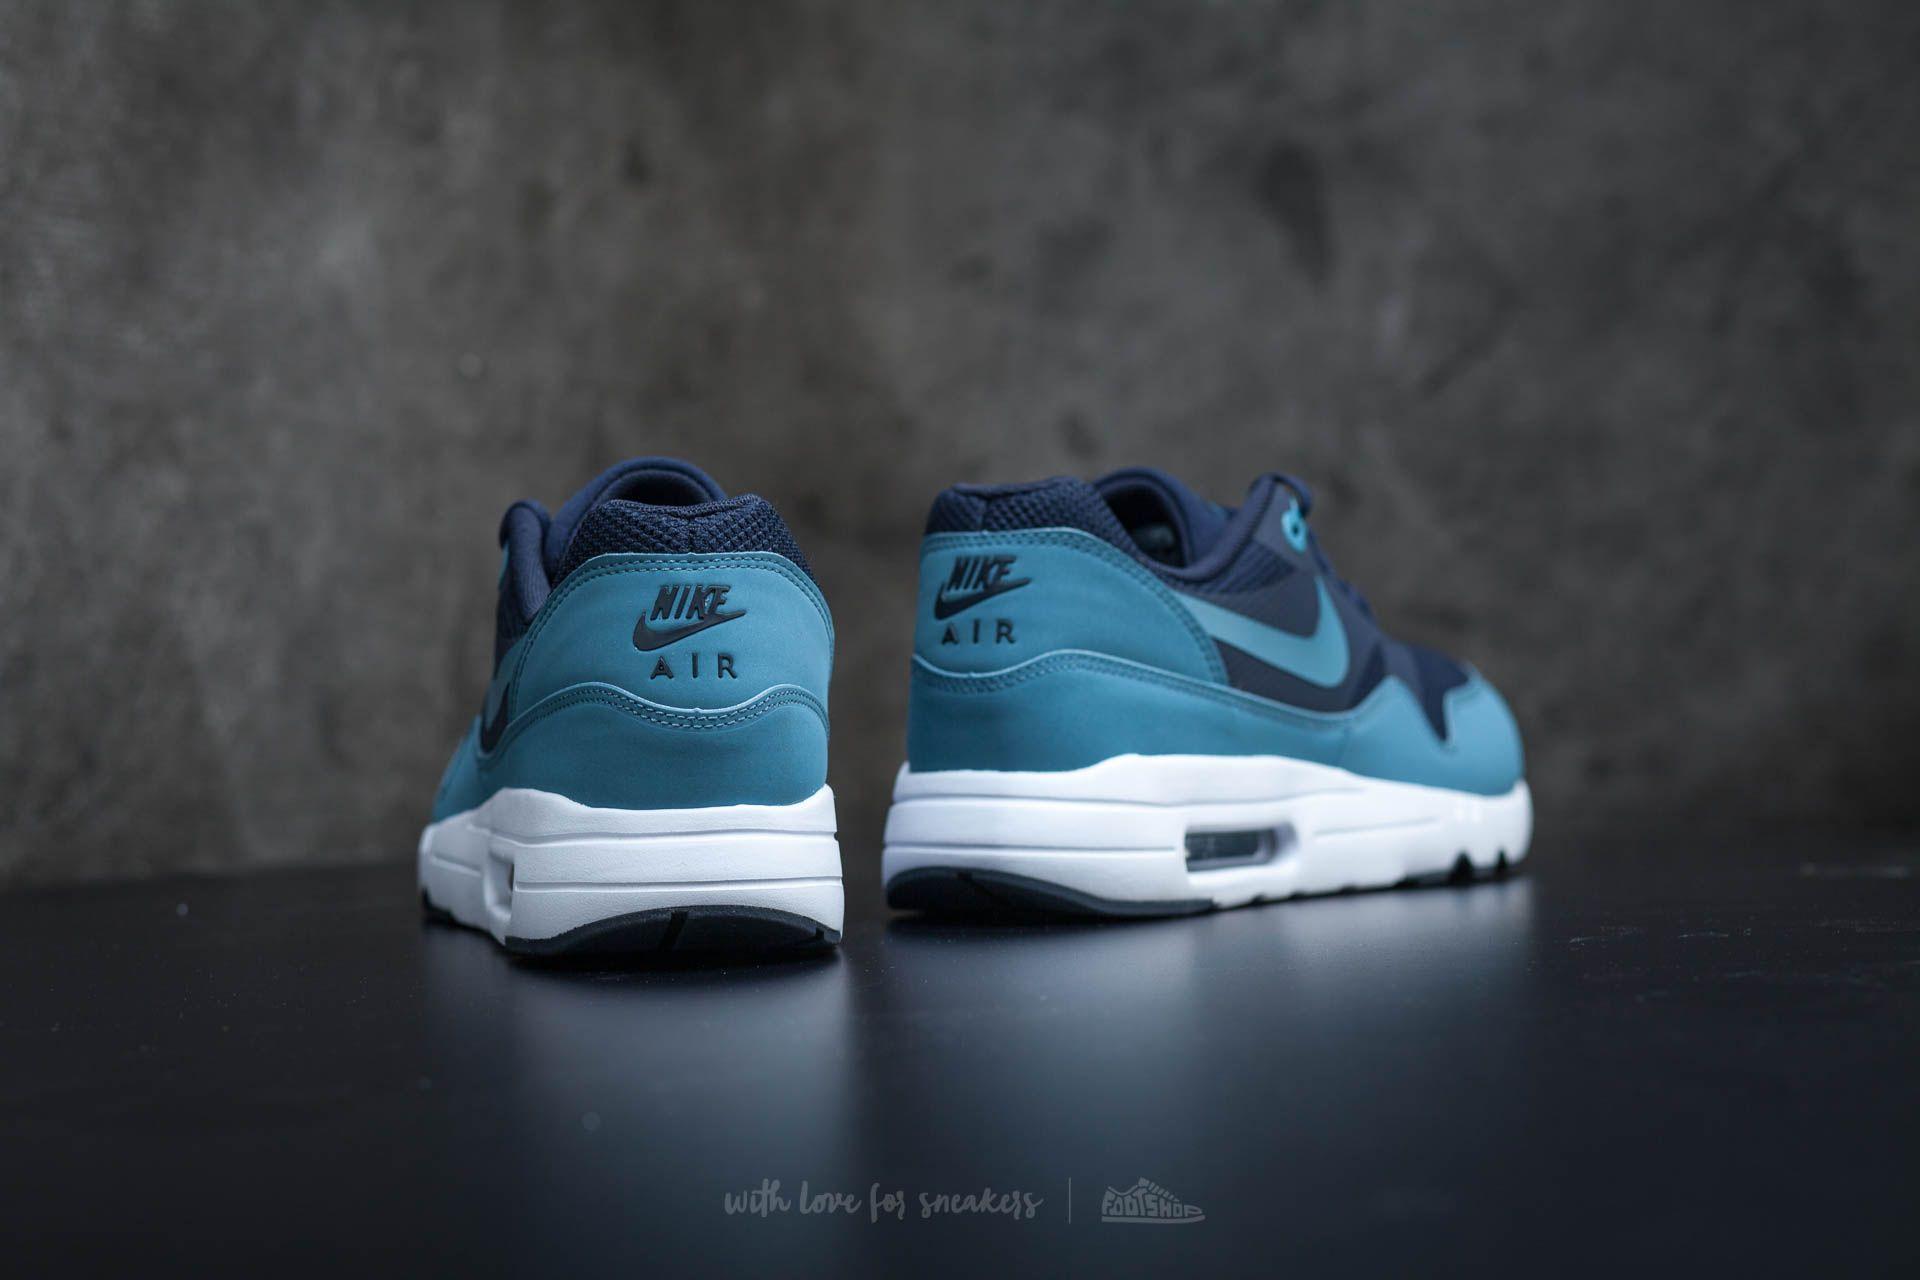 Nike Air Max 1 Ultra 2.0 Essential Obsidian Smokey Blue